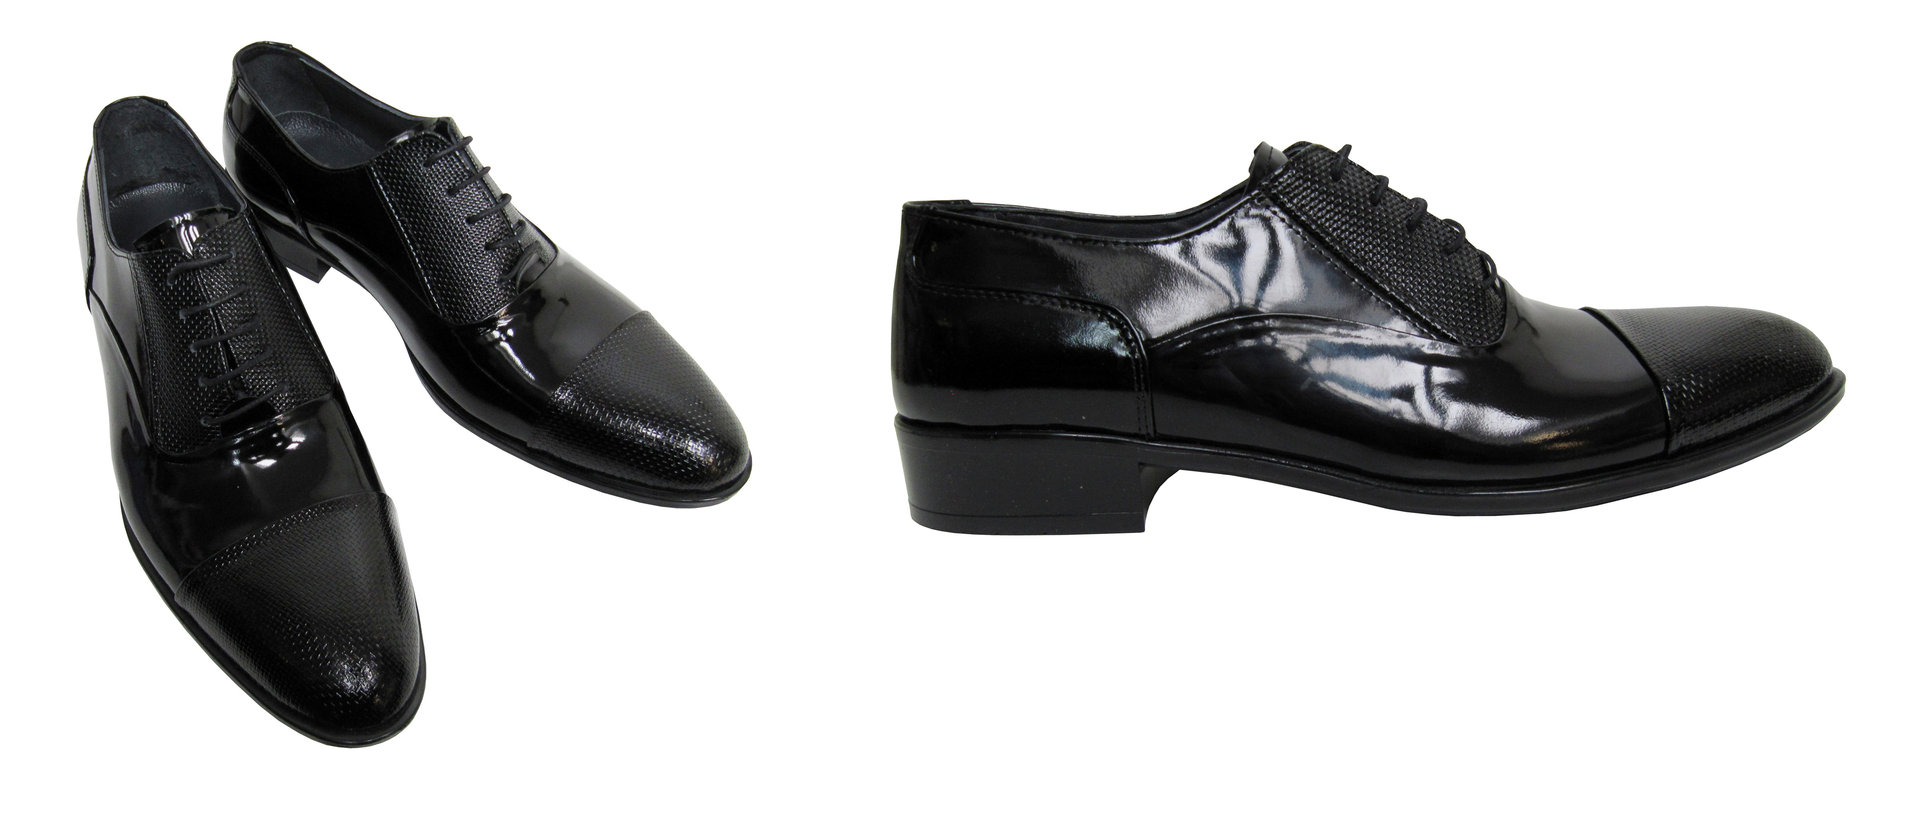 separation shoes 351e6 c3883 Herren Schuhe Smoking Lackschuhe - Muga Herrenausstatter